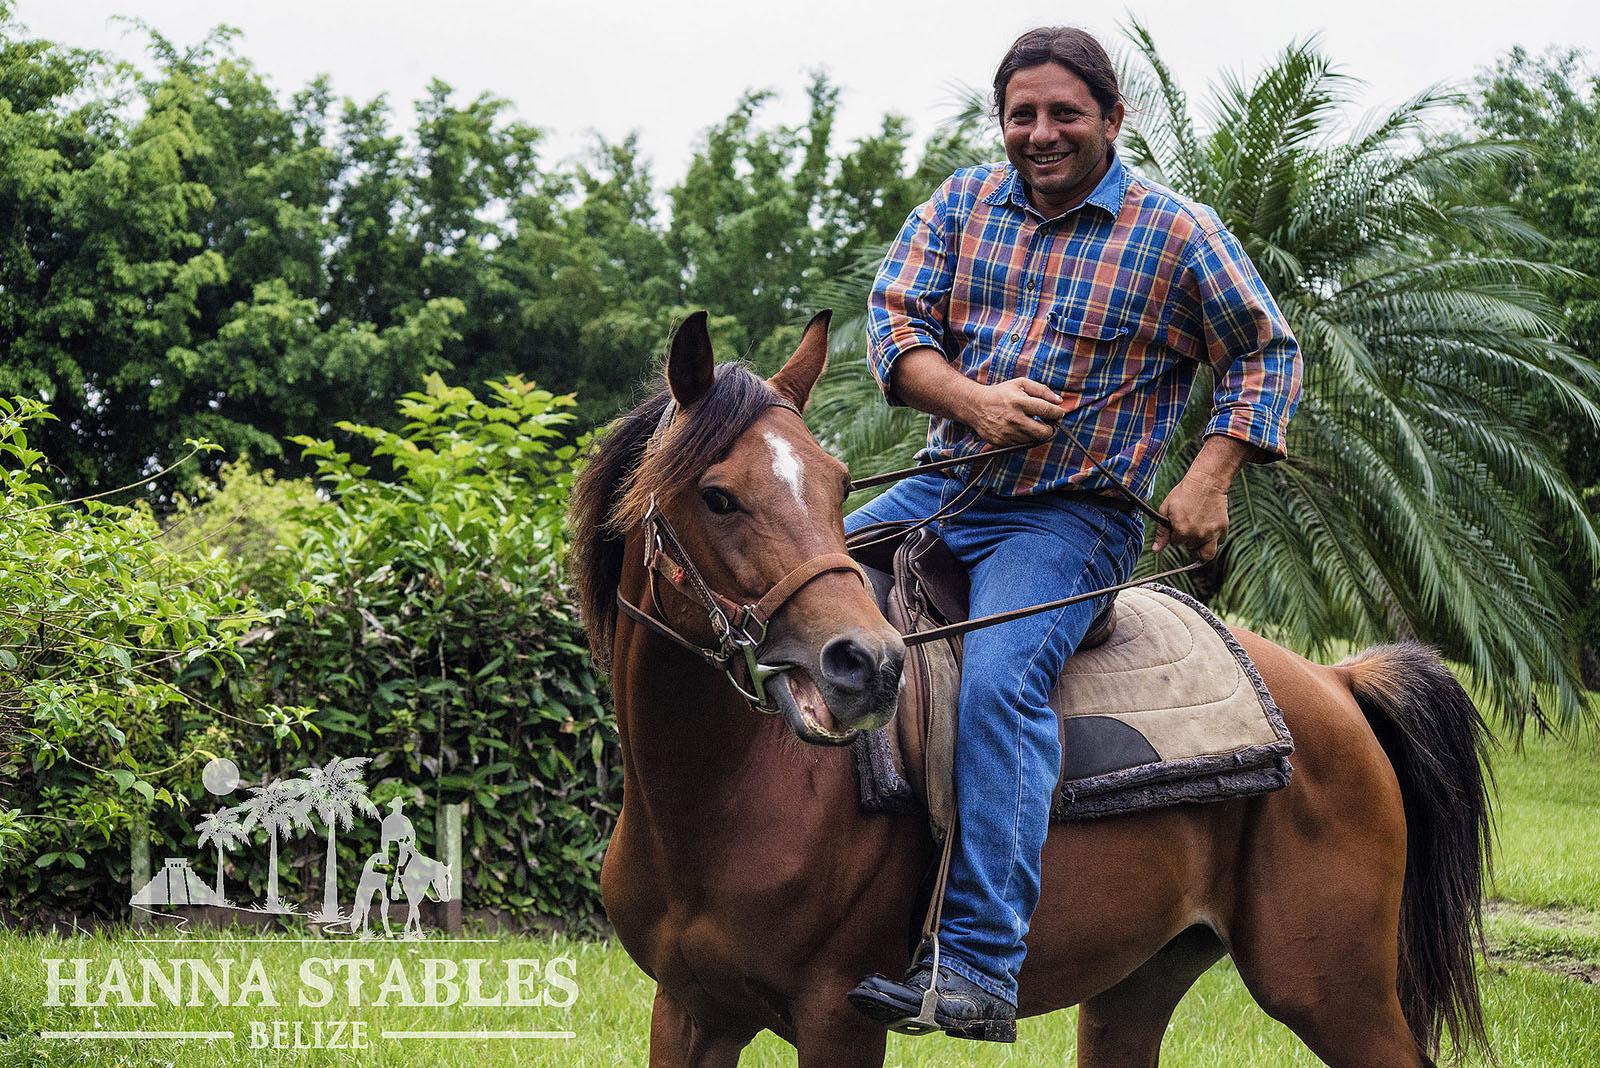 Santiago Hanna Stables Belize